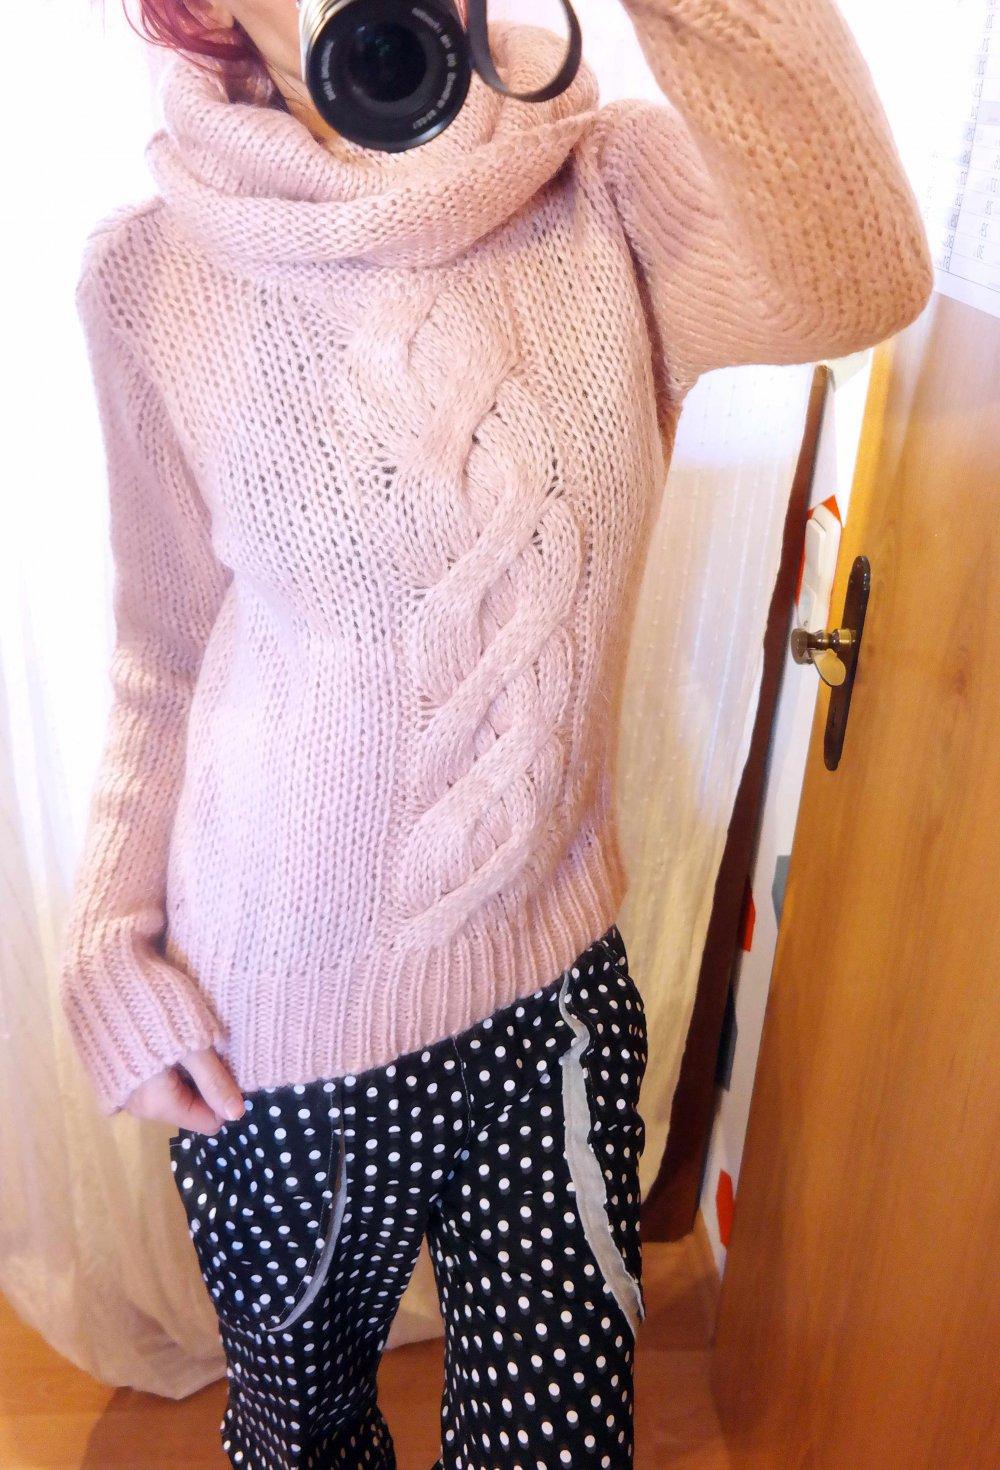 official photos ae6d9 eceab H&M Pullover Rollkragen Grobstrick Wollpullover Mohair rosa rose S M 38 40  warm Winter Strickpullover